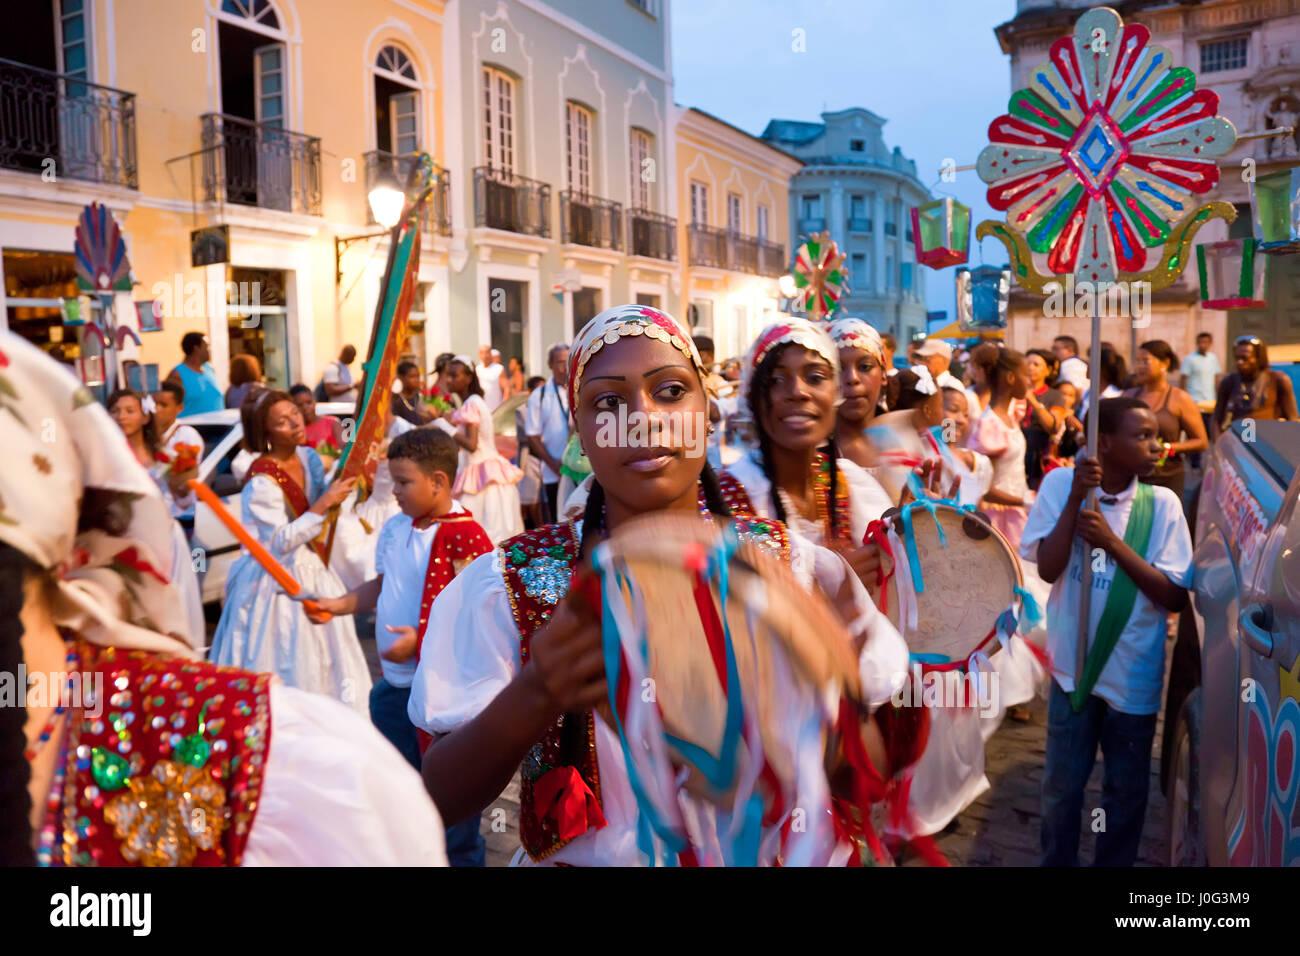 Processione di natale & carnevale, Pelourinho, Salvador, Bahia, Brasile Immagini Stock